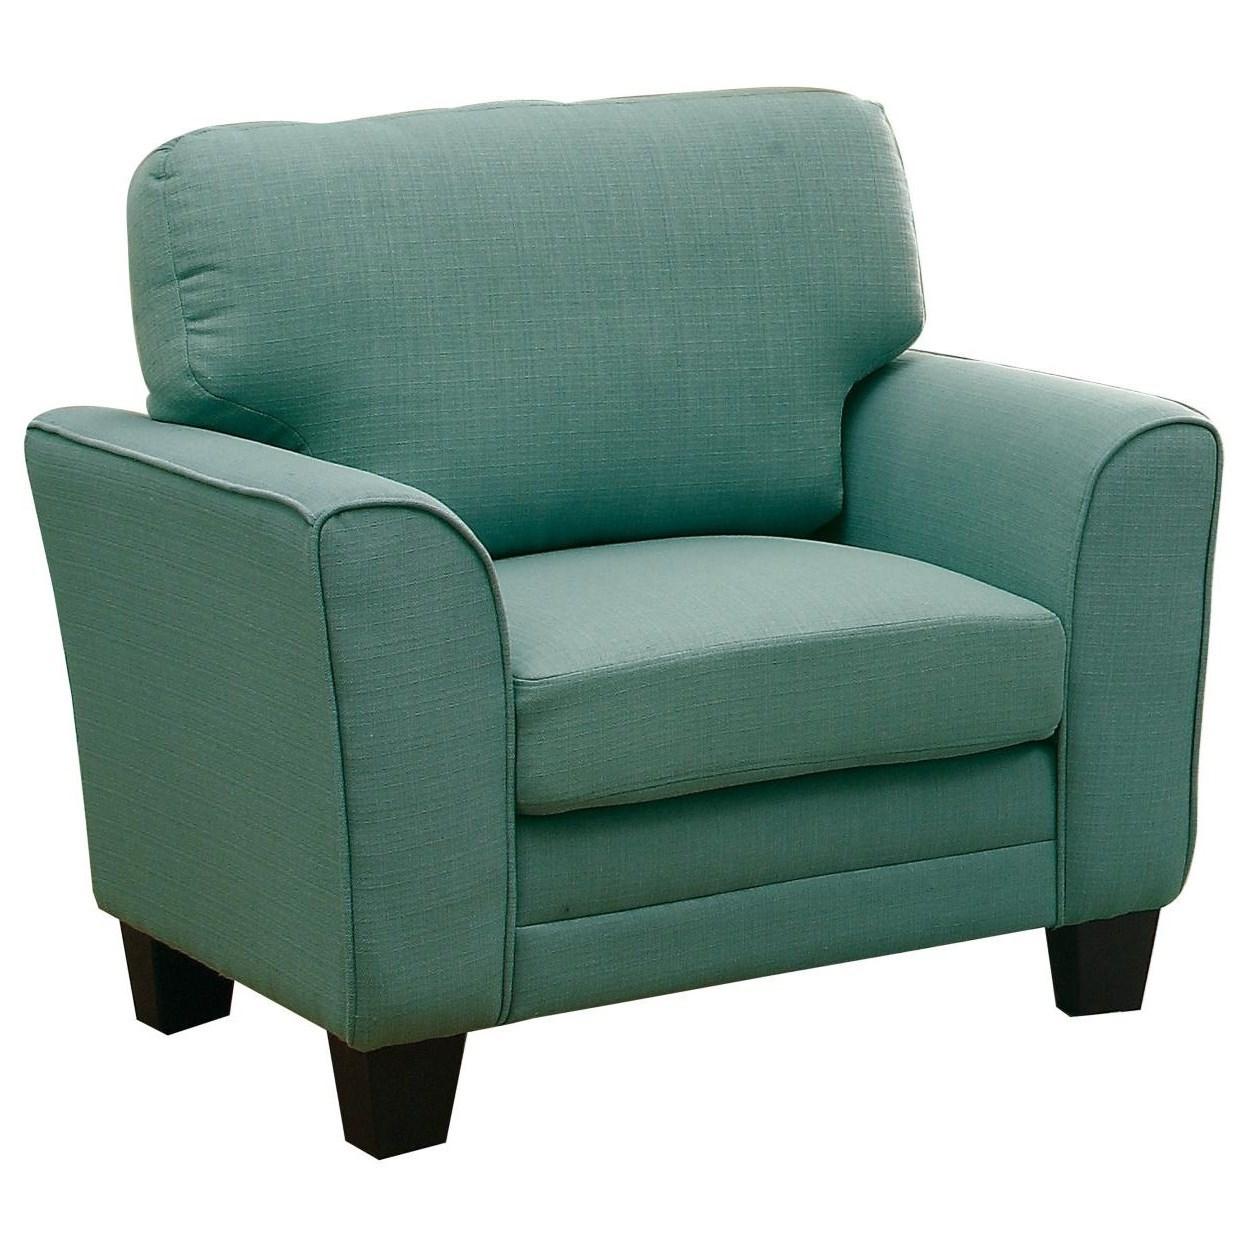 Adair Chair by Homelegance at Carolina Direct